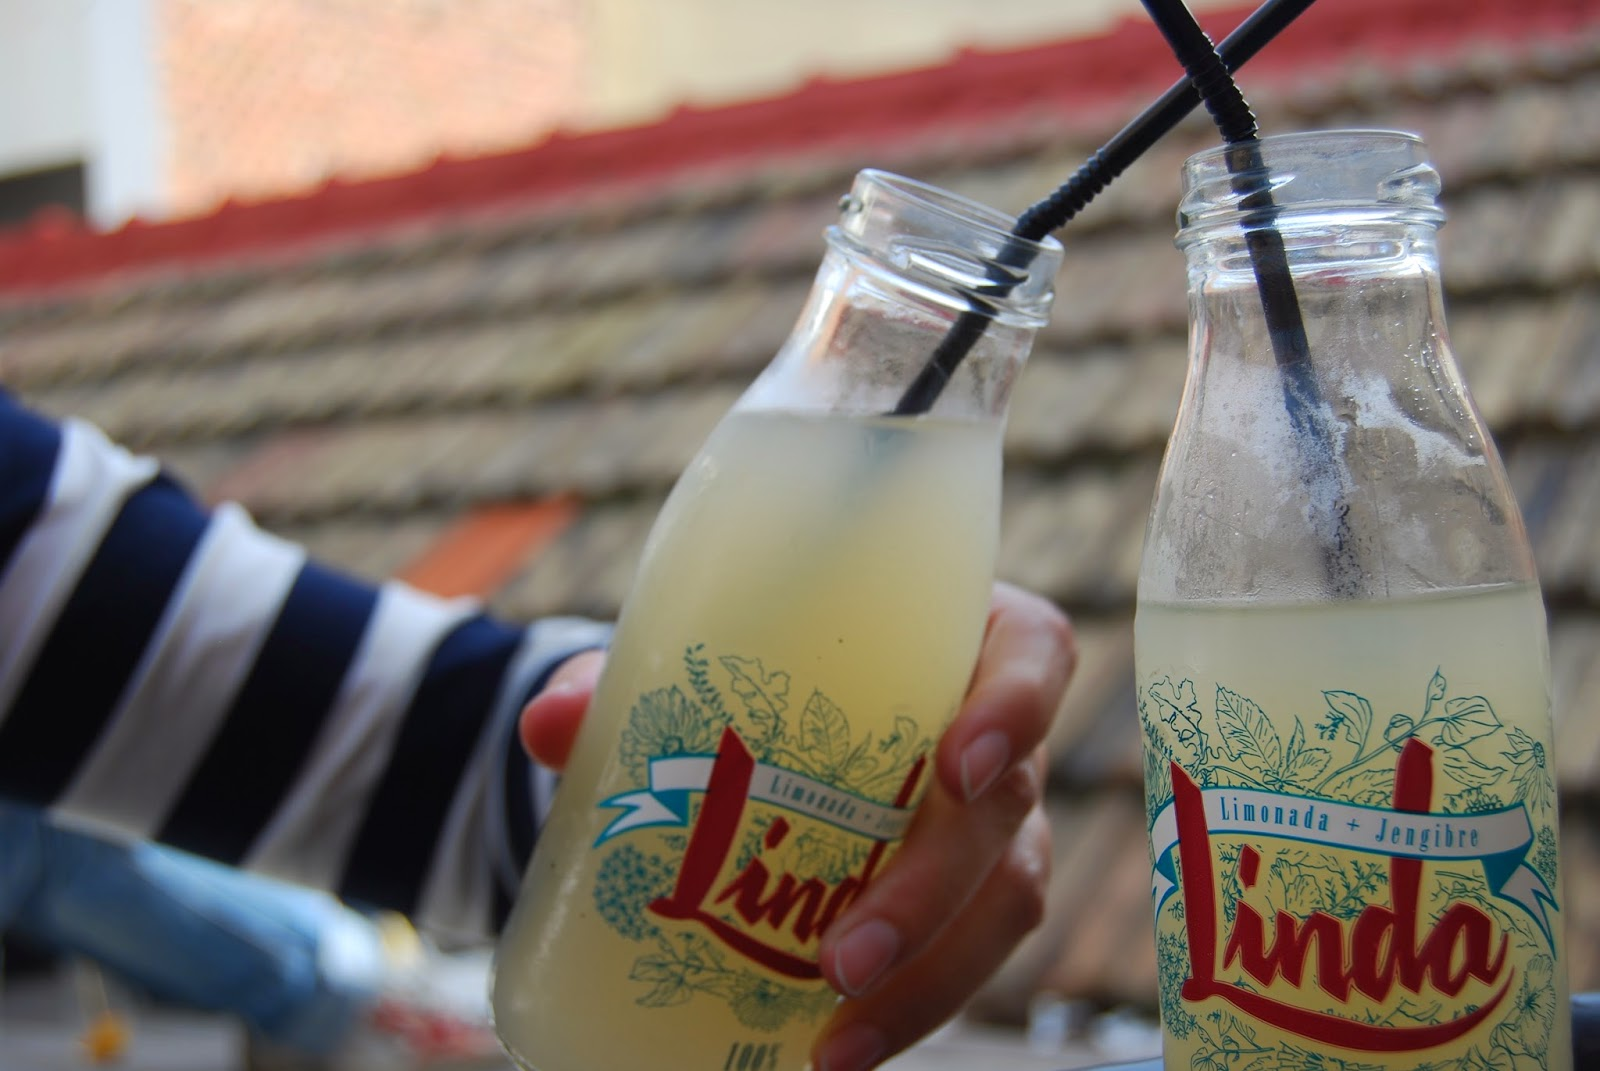 http://sosunnyblog.blogspot.com.es/2014/11/the-hovse-bonitismo-amigas-y-limonada.html